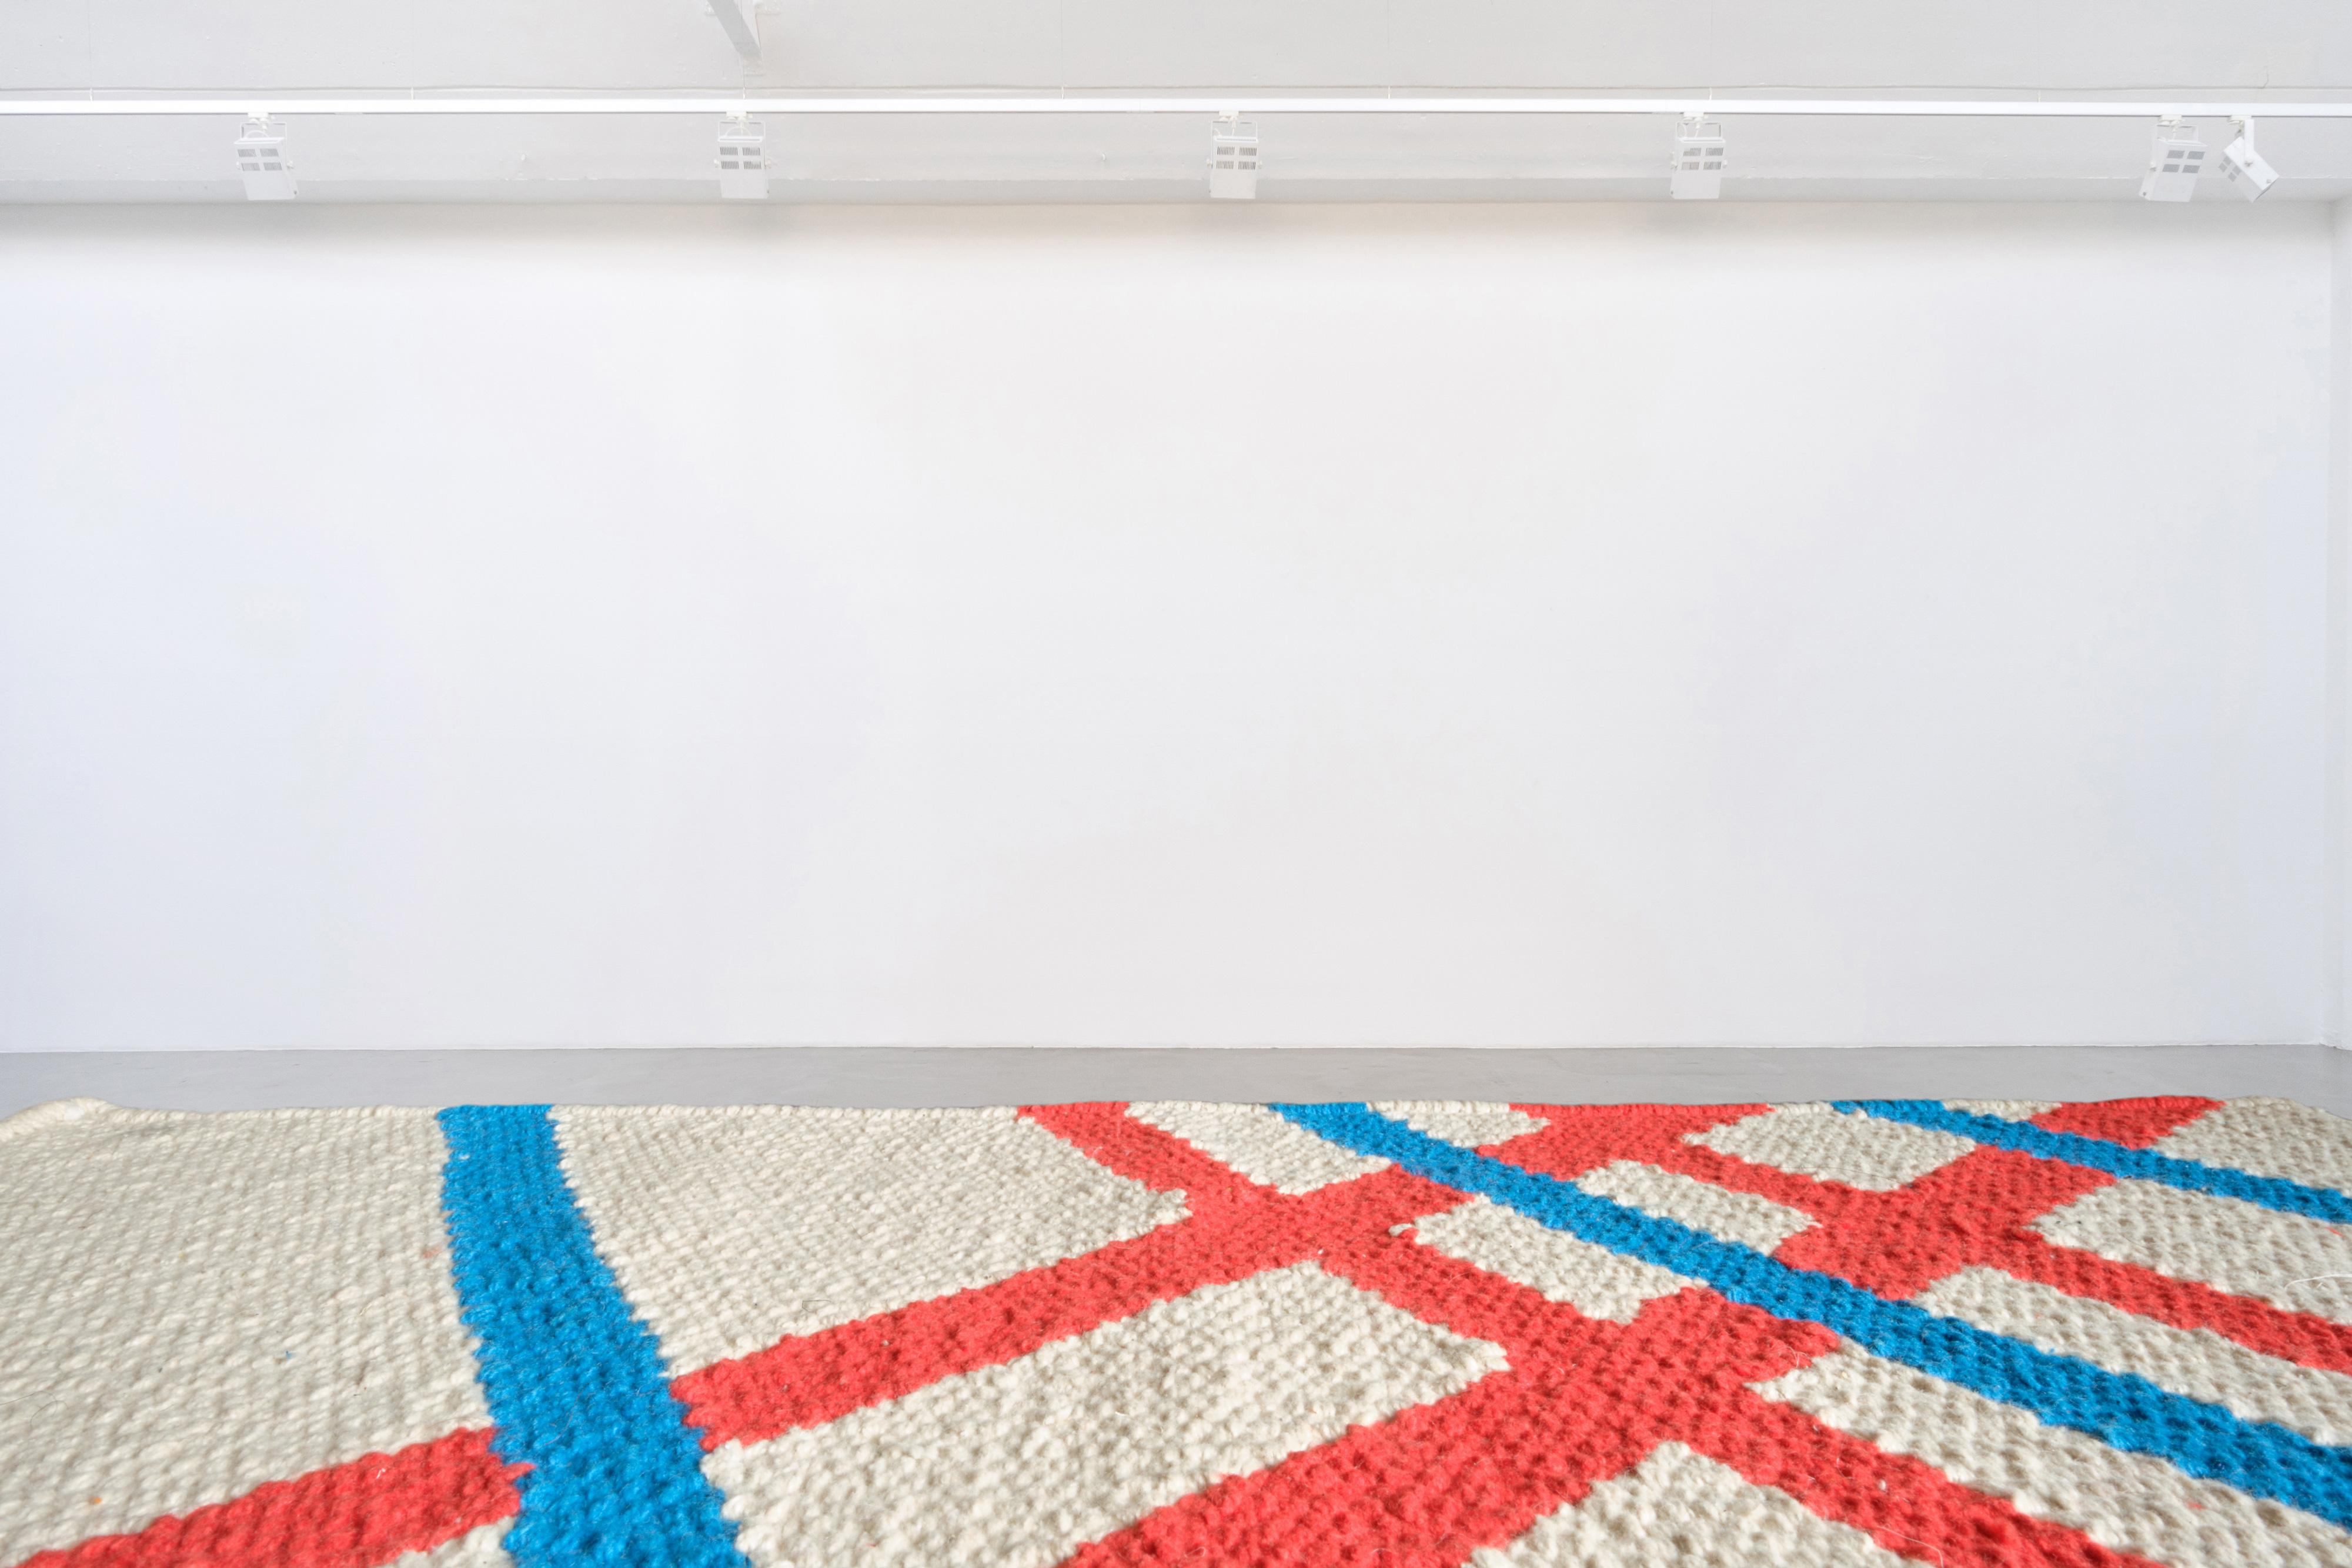 Galerie Barbara Thumm \ New Viewings #17 \ Karim Noureldin